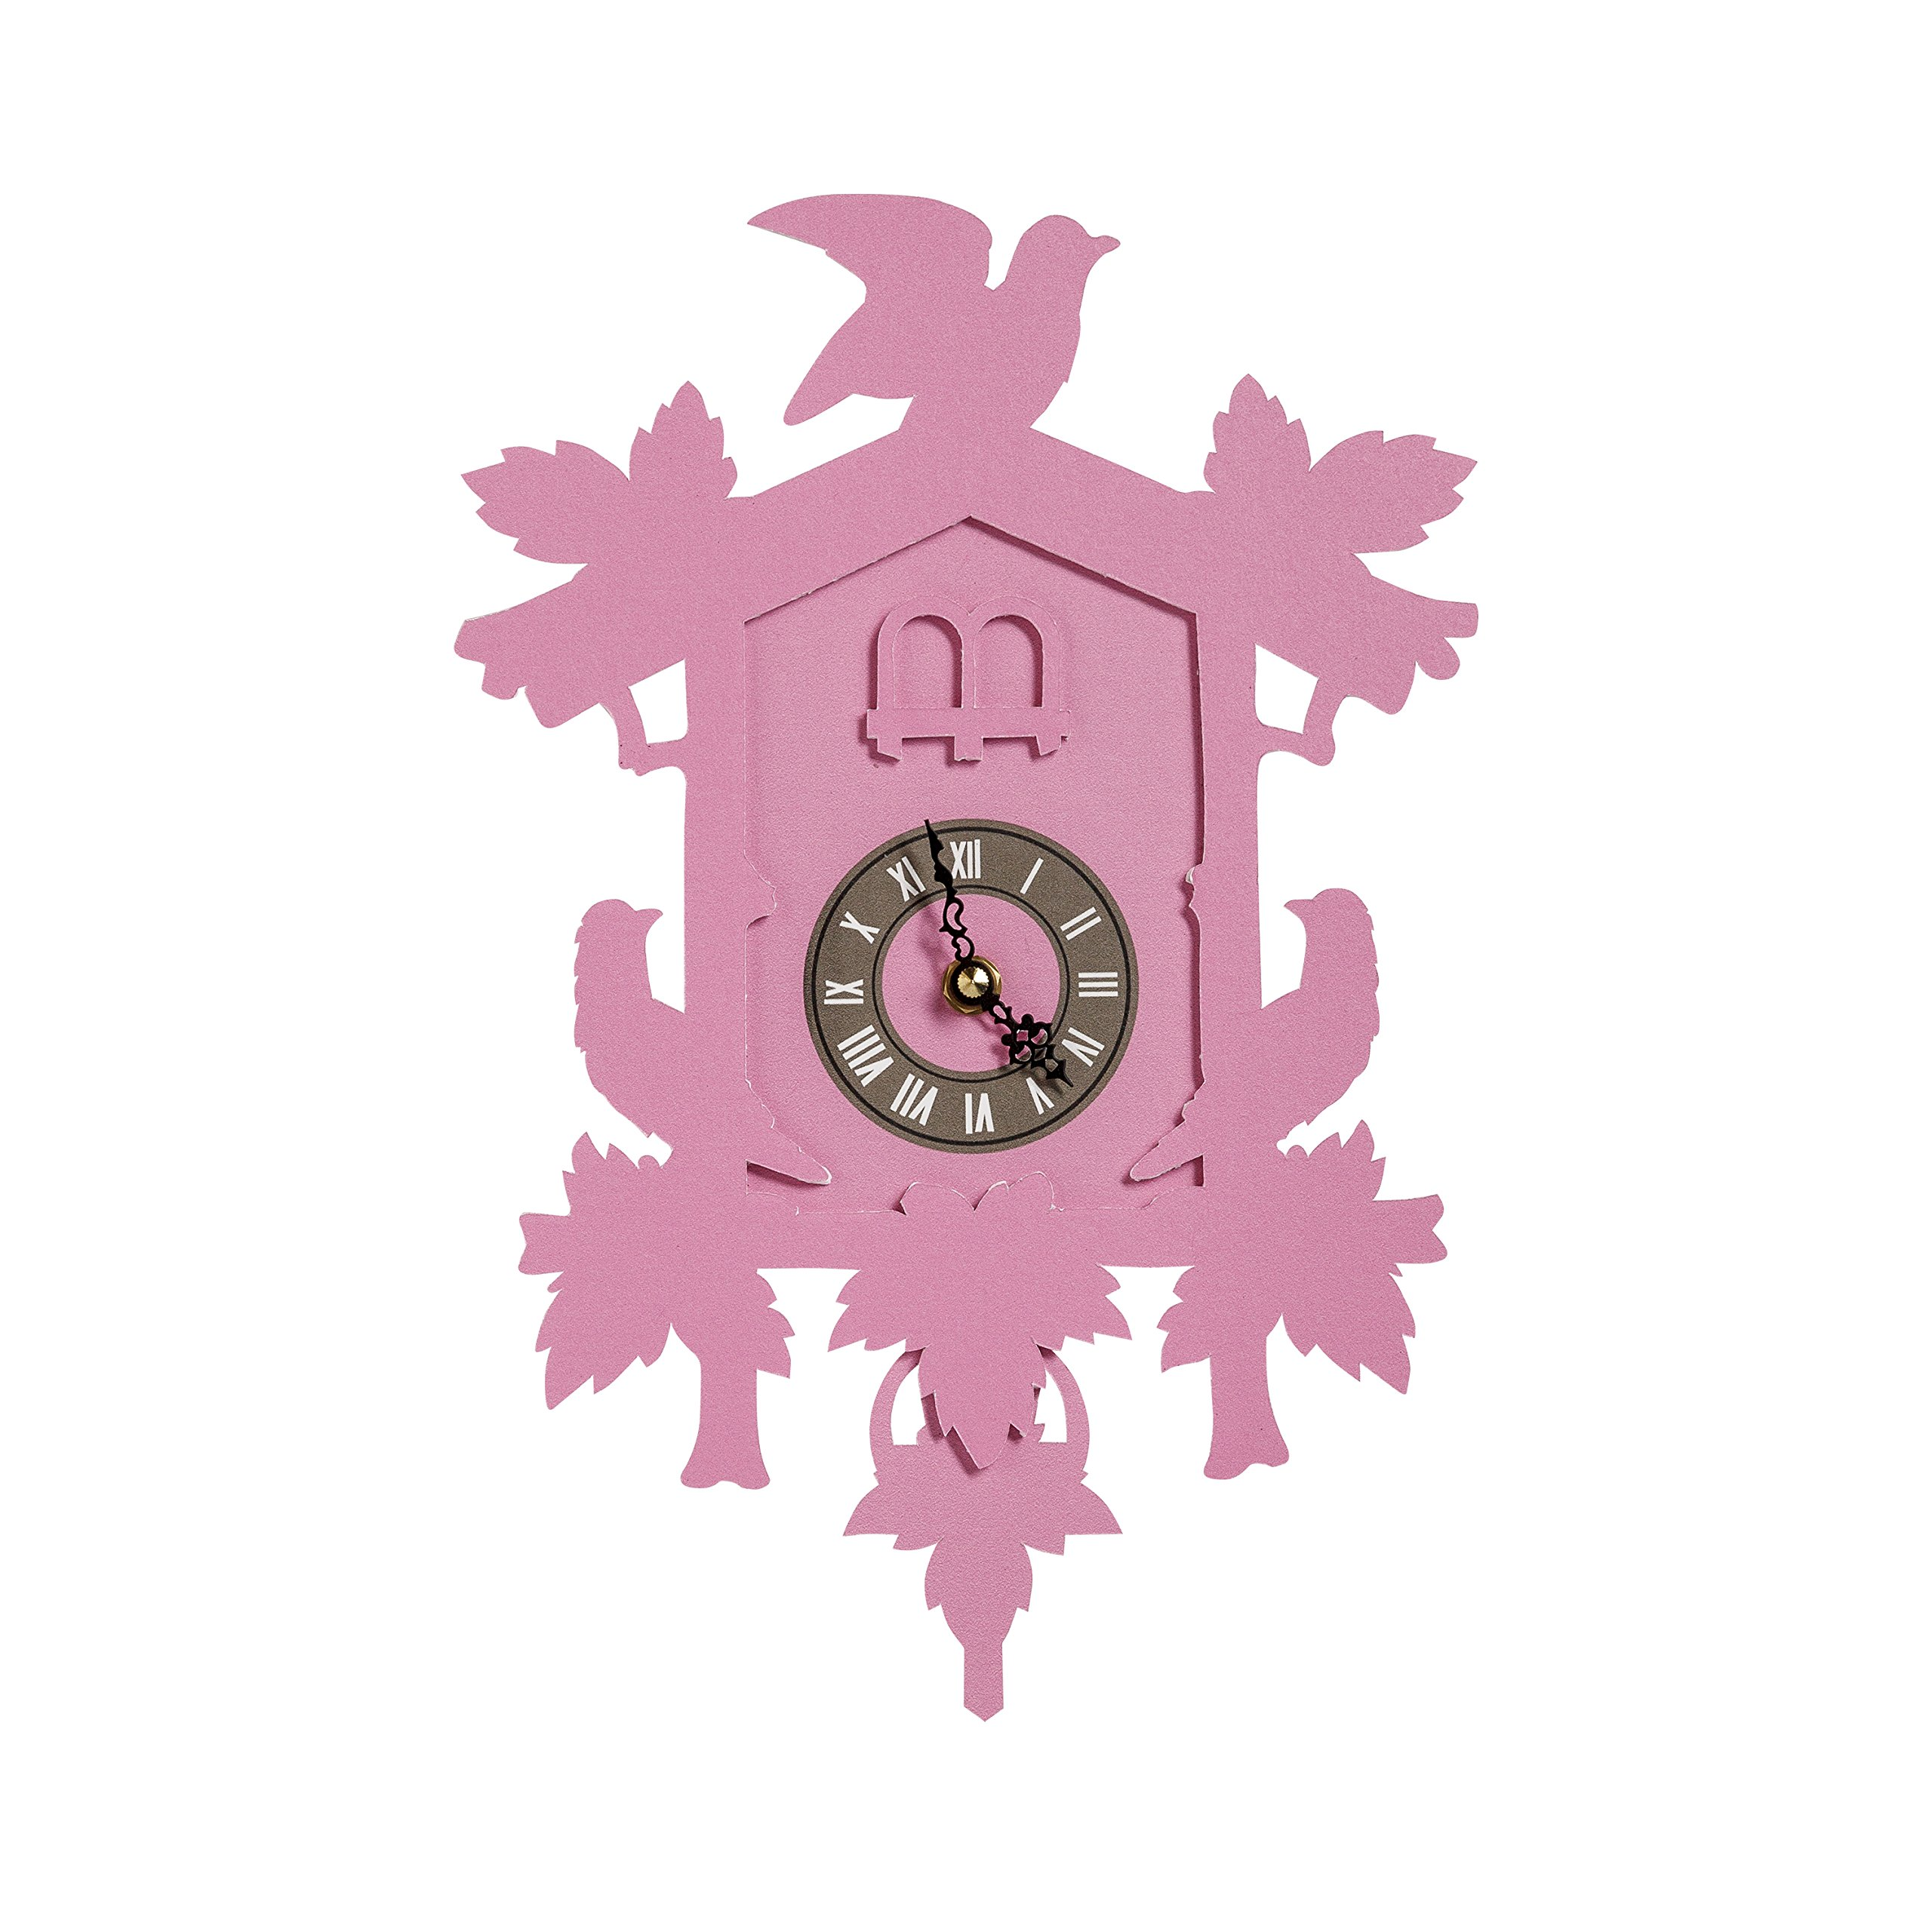 FunDeco Cuckoo Clock, Fuchsia, Small